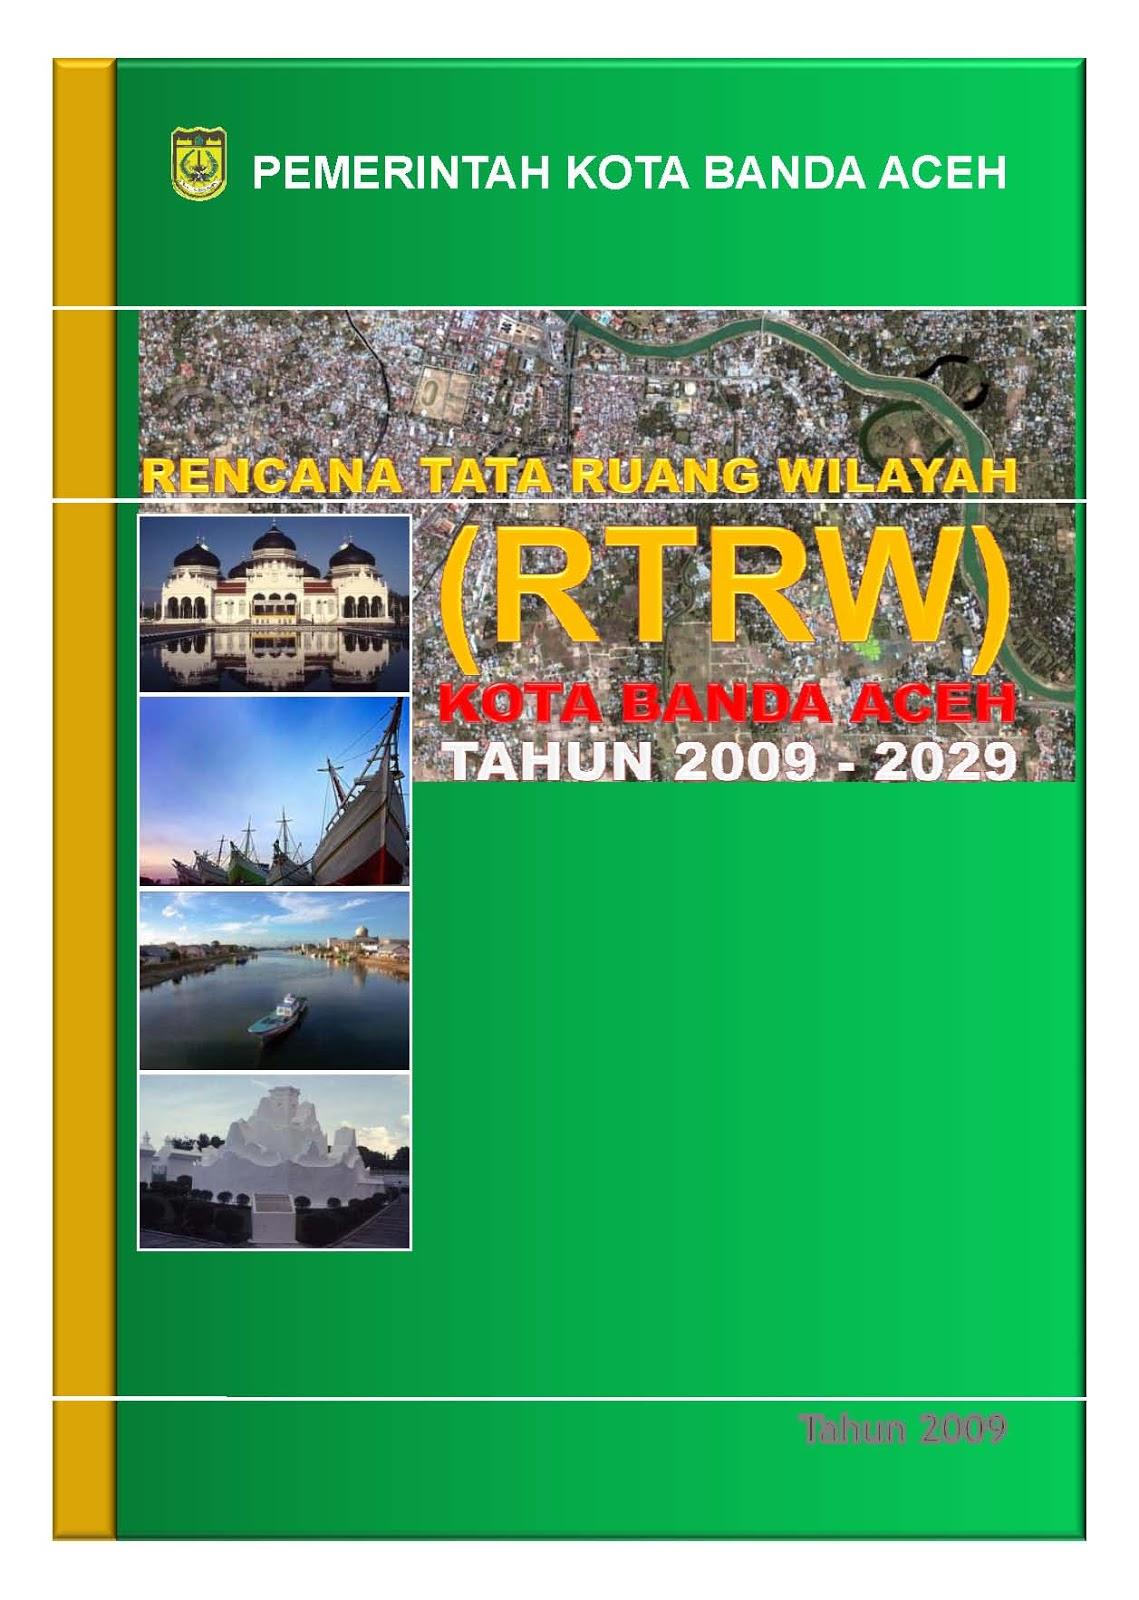 Image search: Peta Kota Banda Aceh